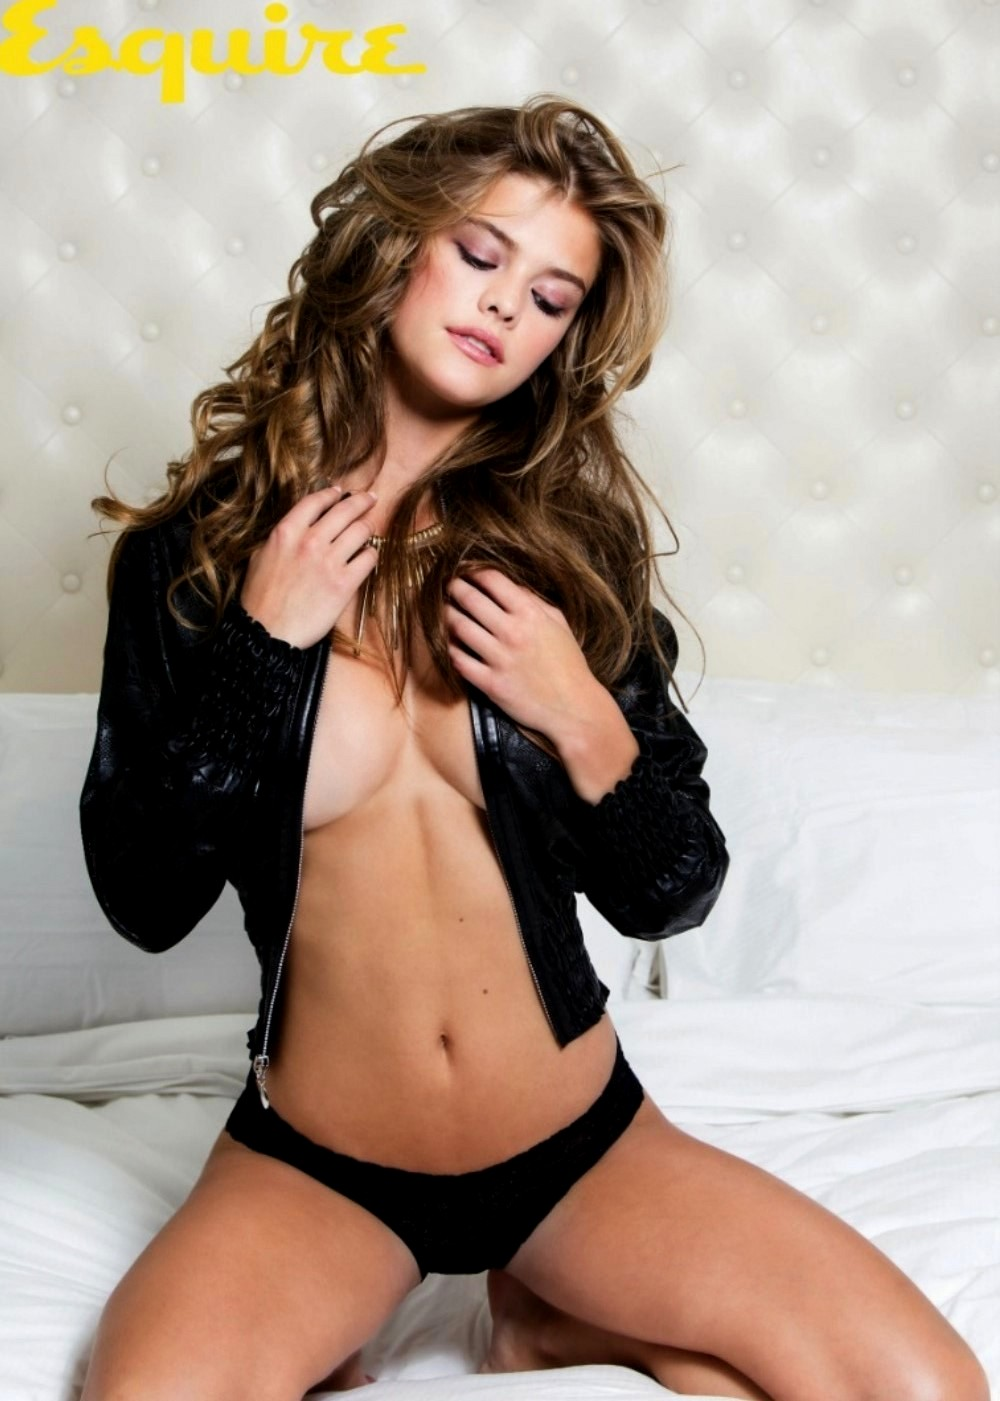 Nina Agdal Body Images